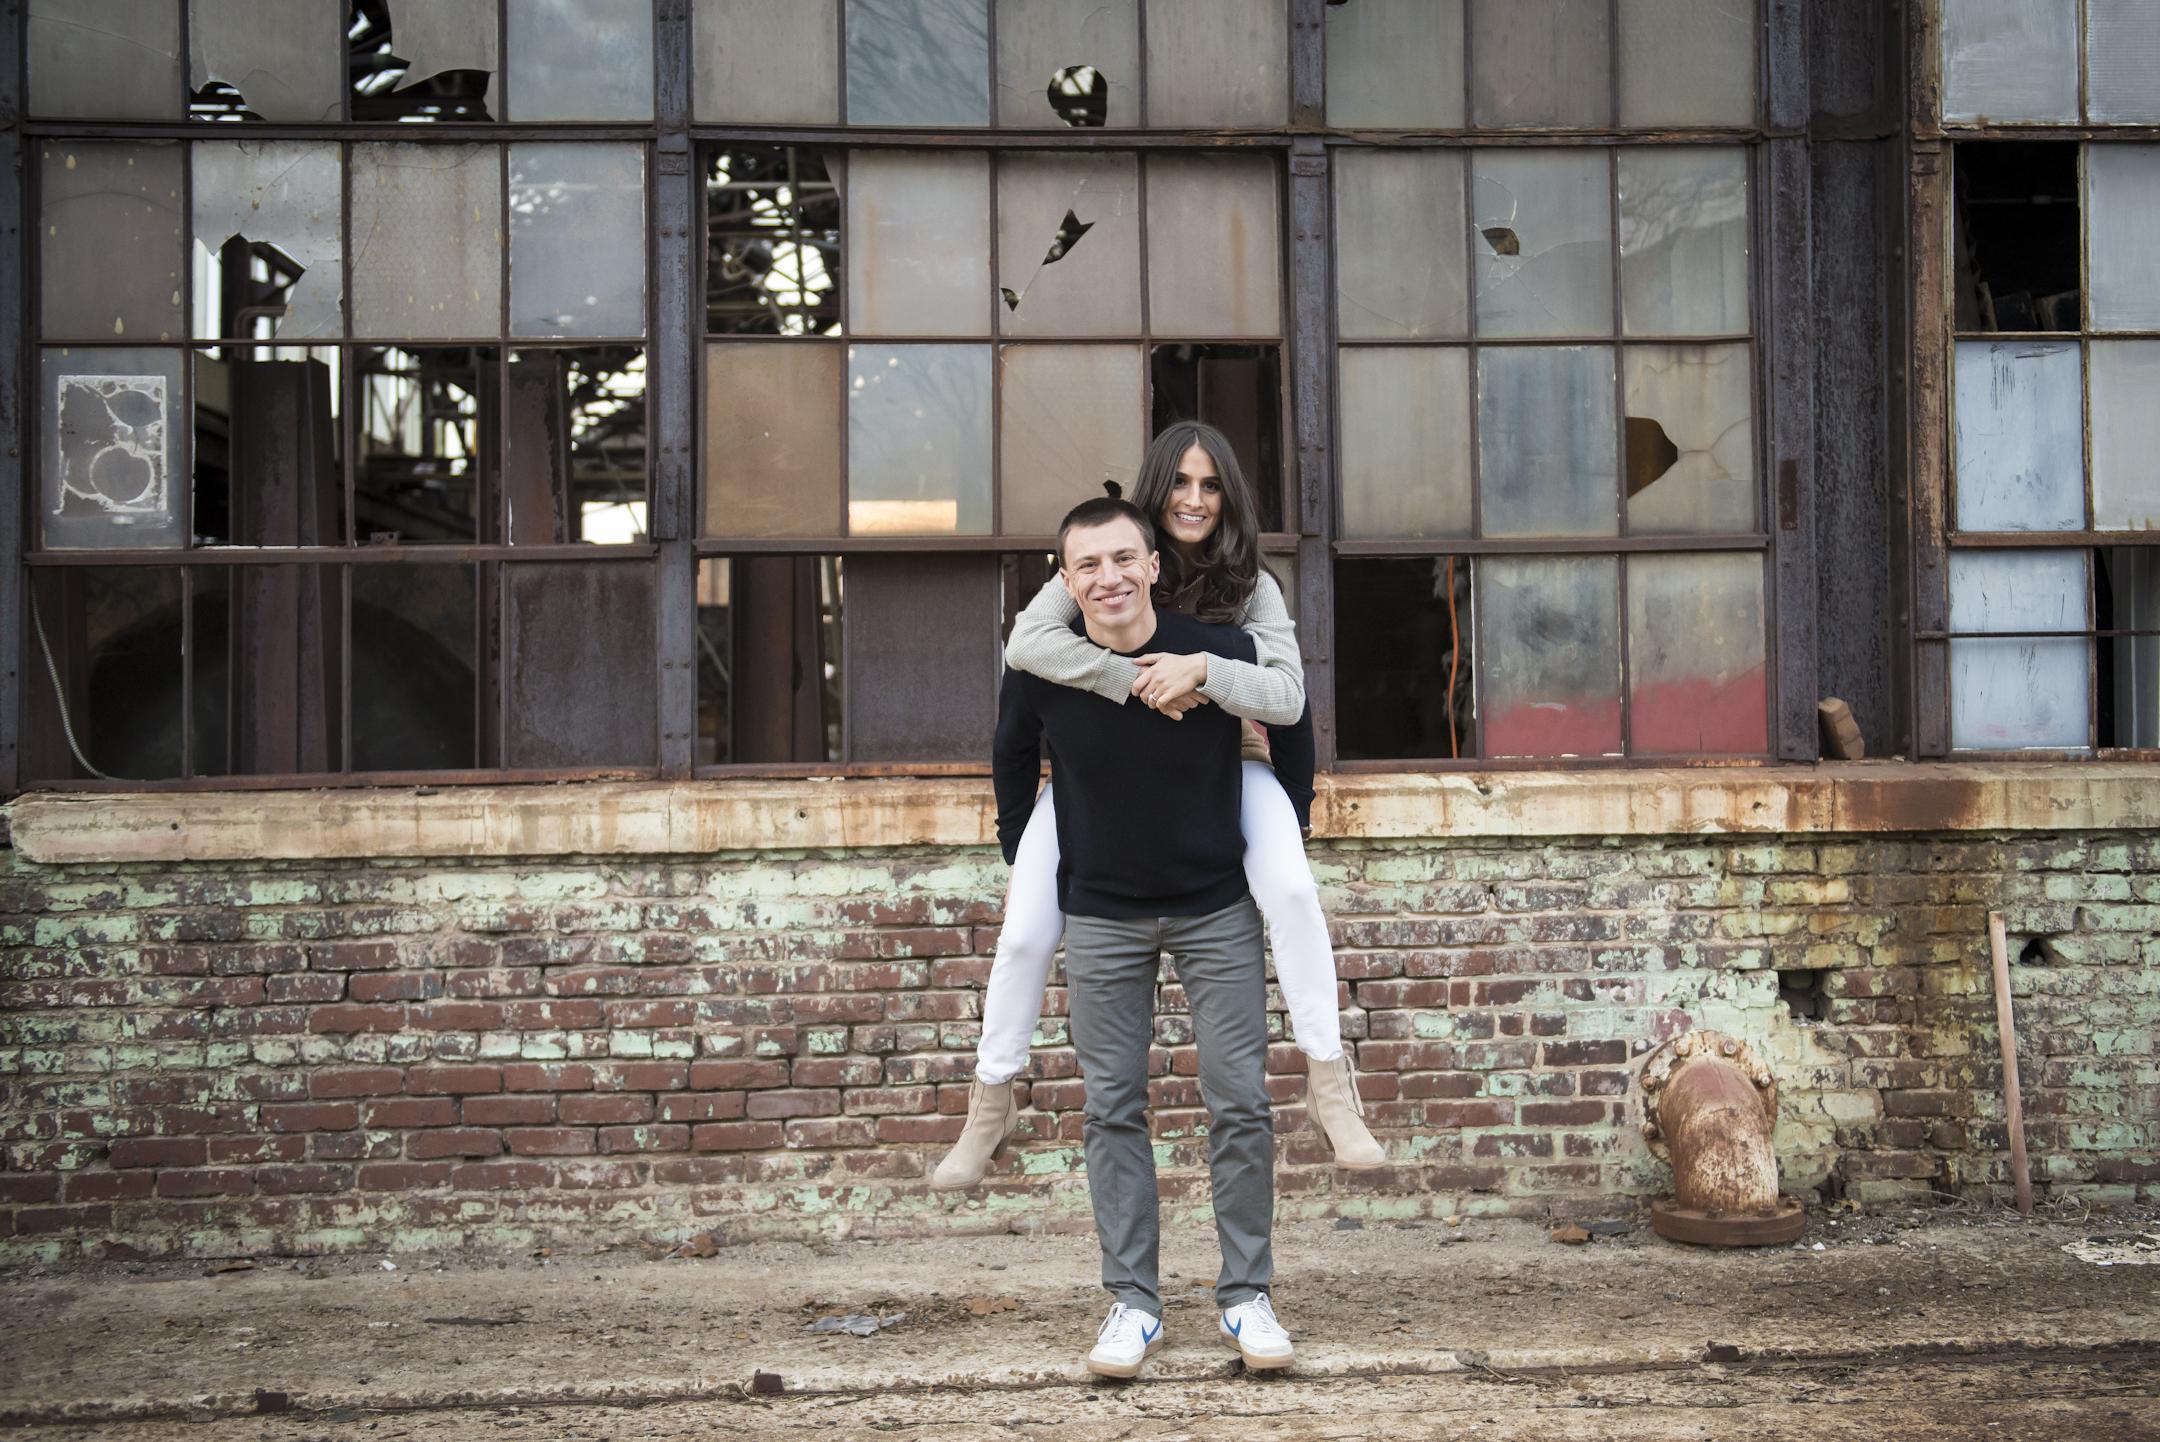 Jason&Brigitta_Engagement0004-5.jpg